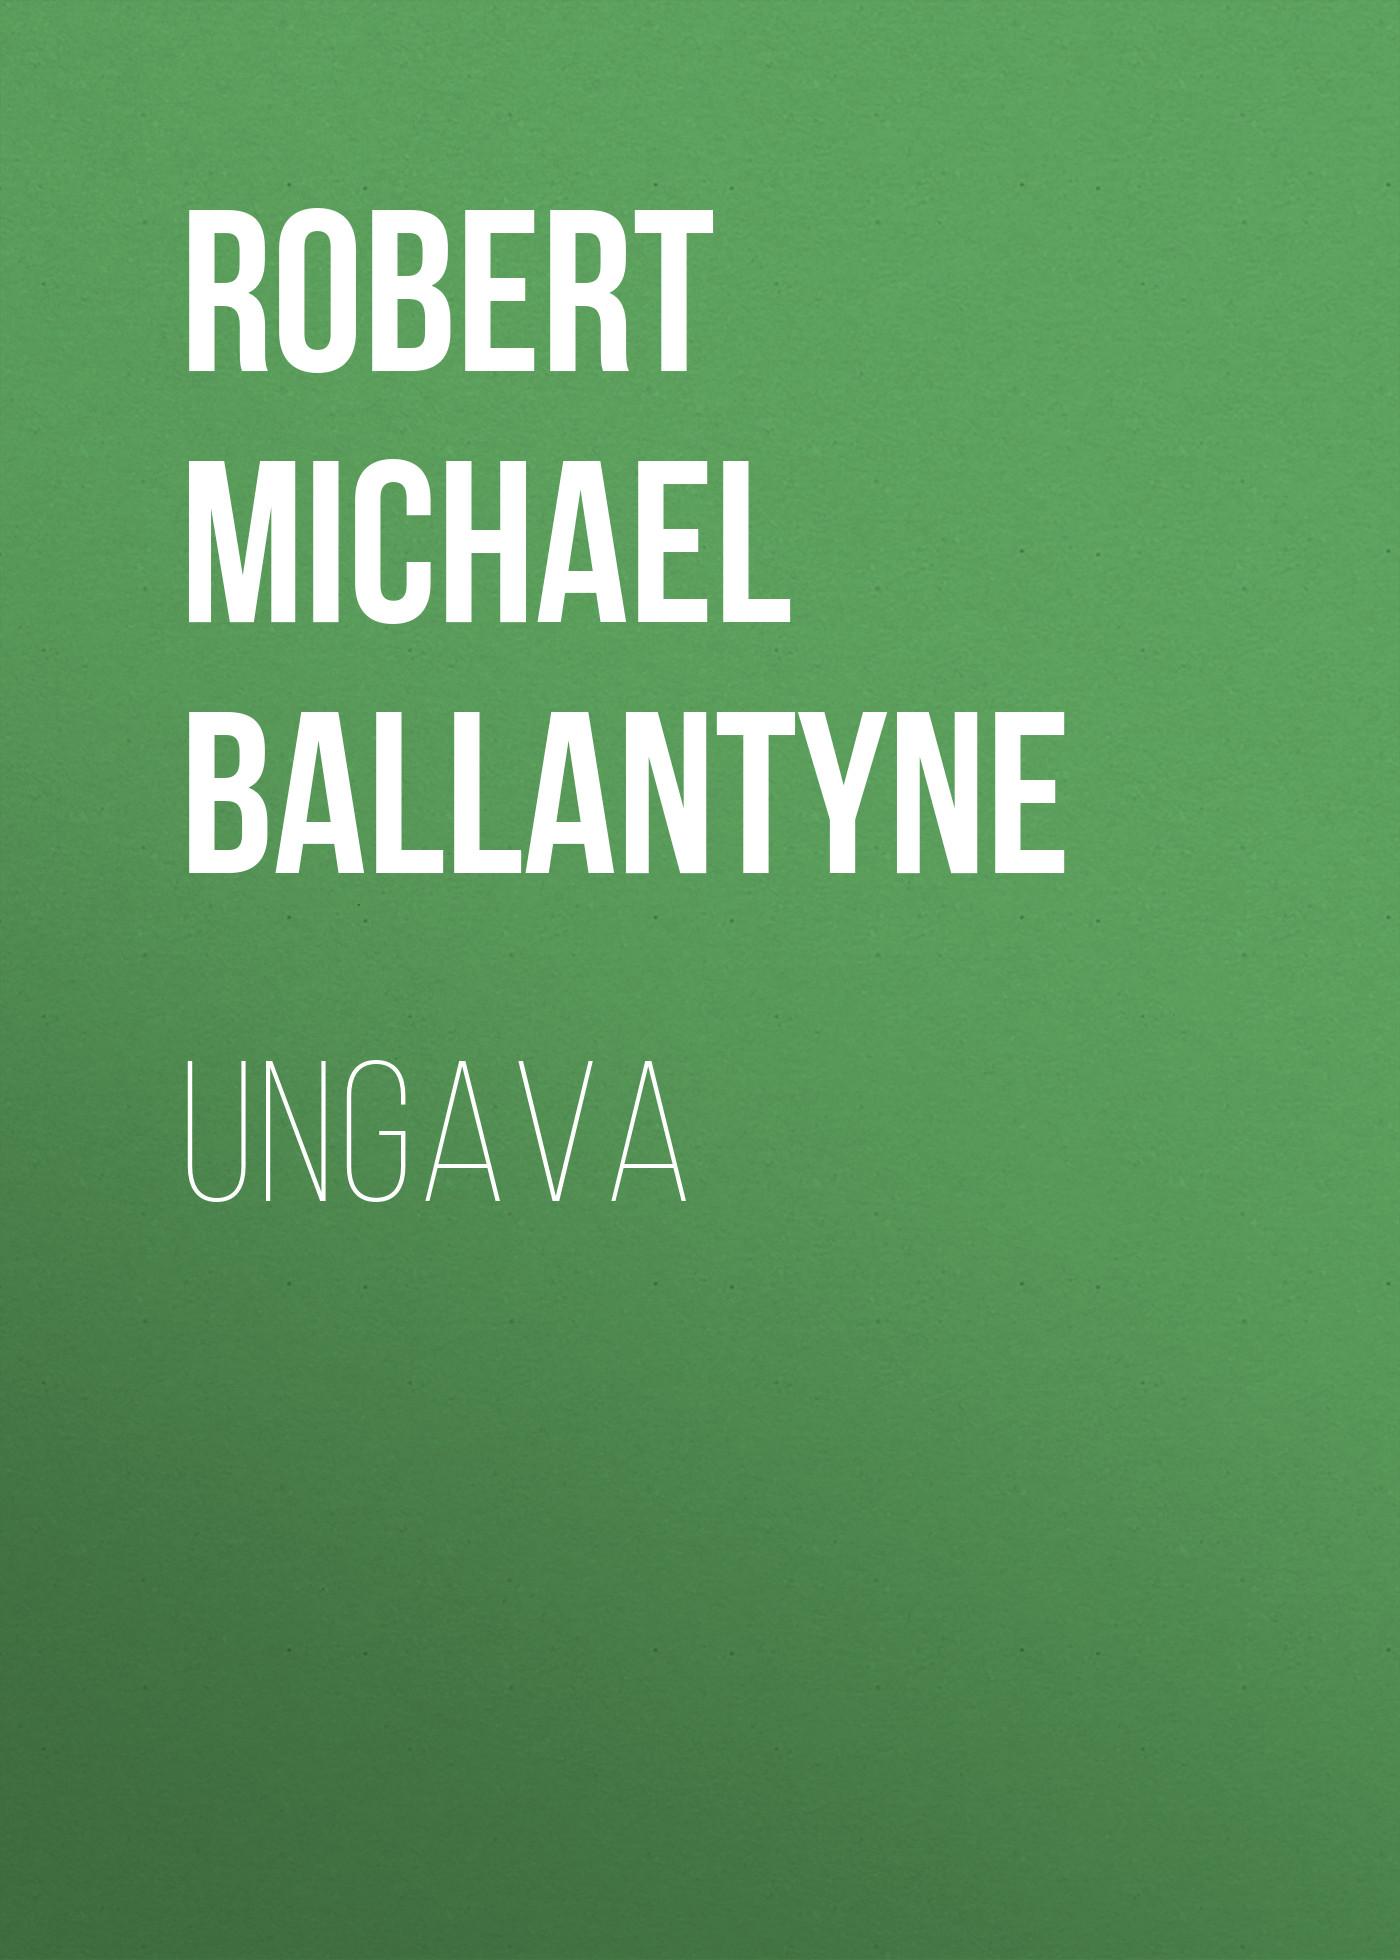 лучшая цена Robert Michael Ballantyne Ungava